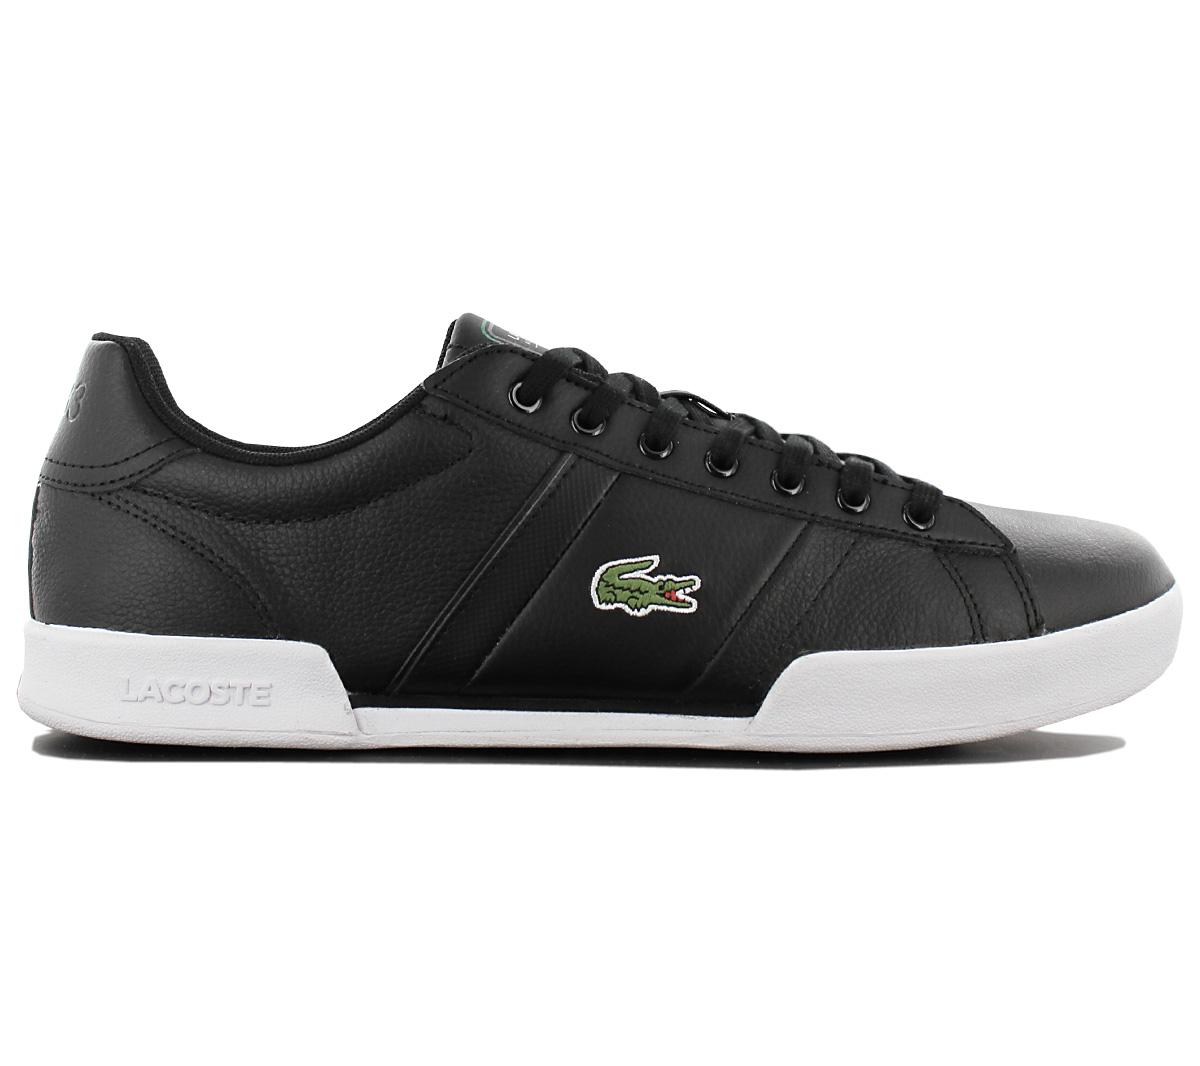 cb6689052 Lacoste Deston Htb Spm Mens Sneakers Leather Shoes Trainers ...